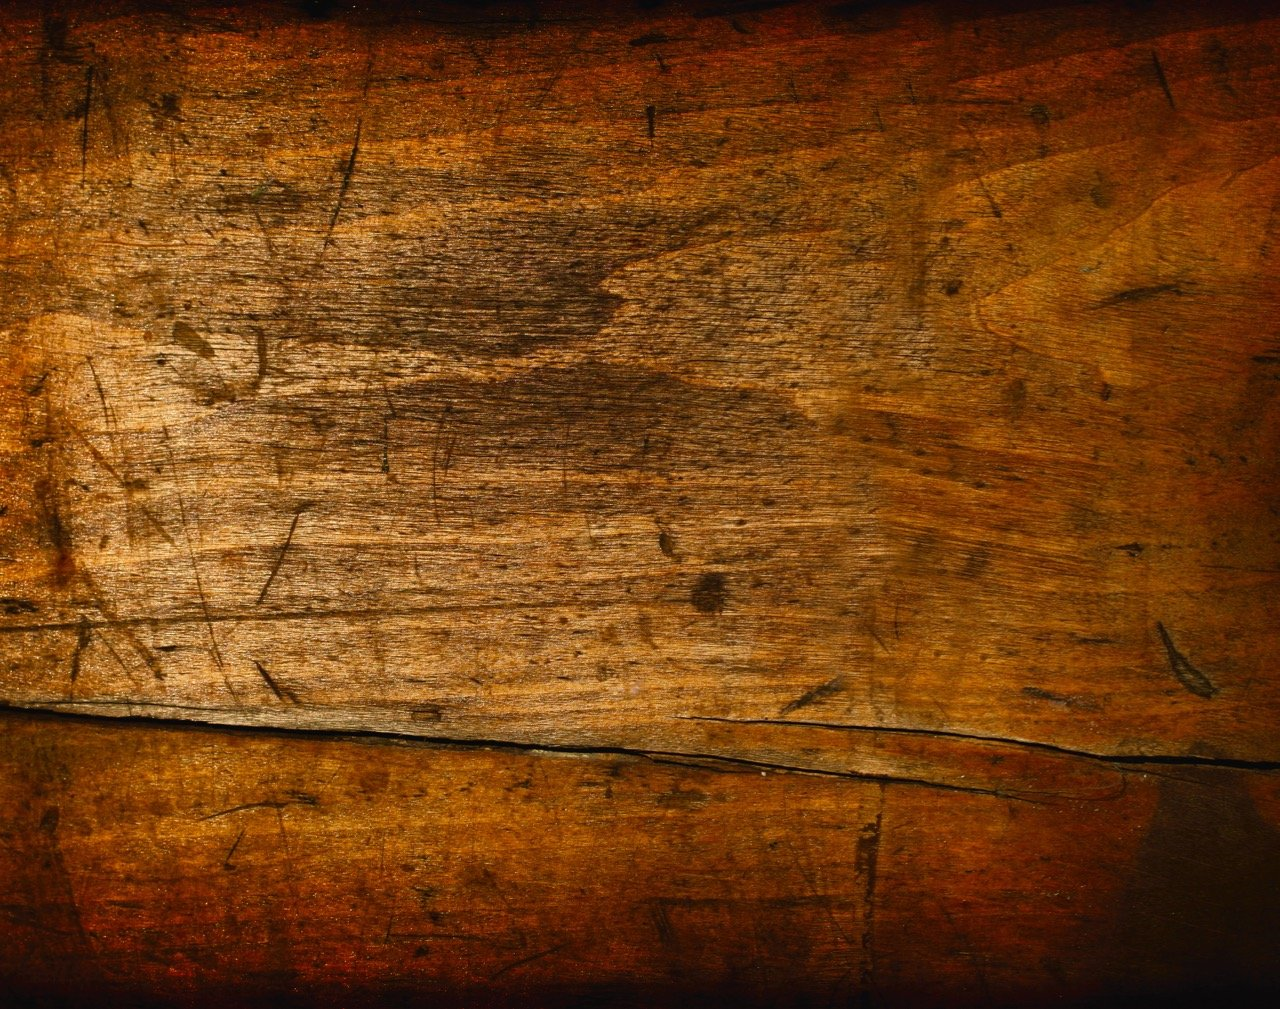 Photo Backdrop Board, 28 in x 22 in x 1/5 in 5 designs (Rustic Wood)